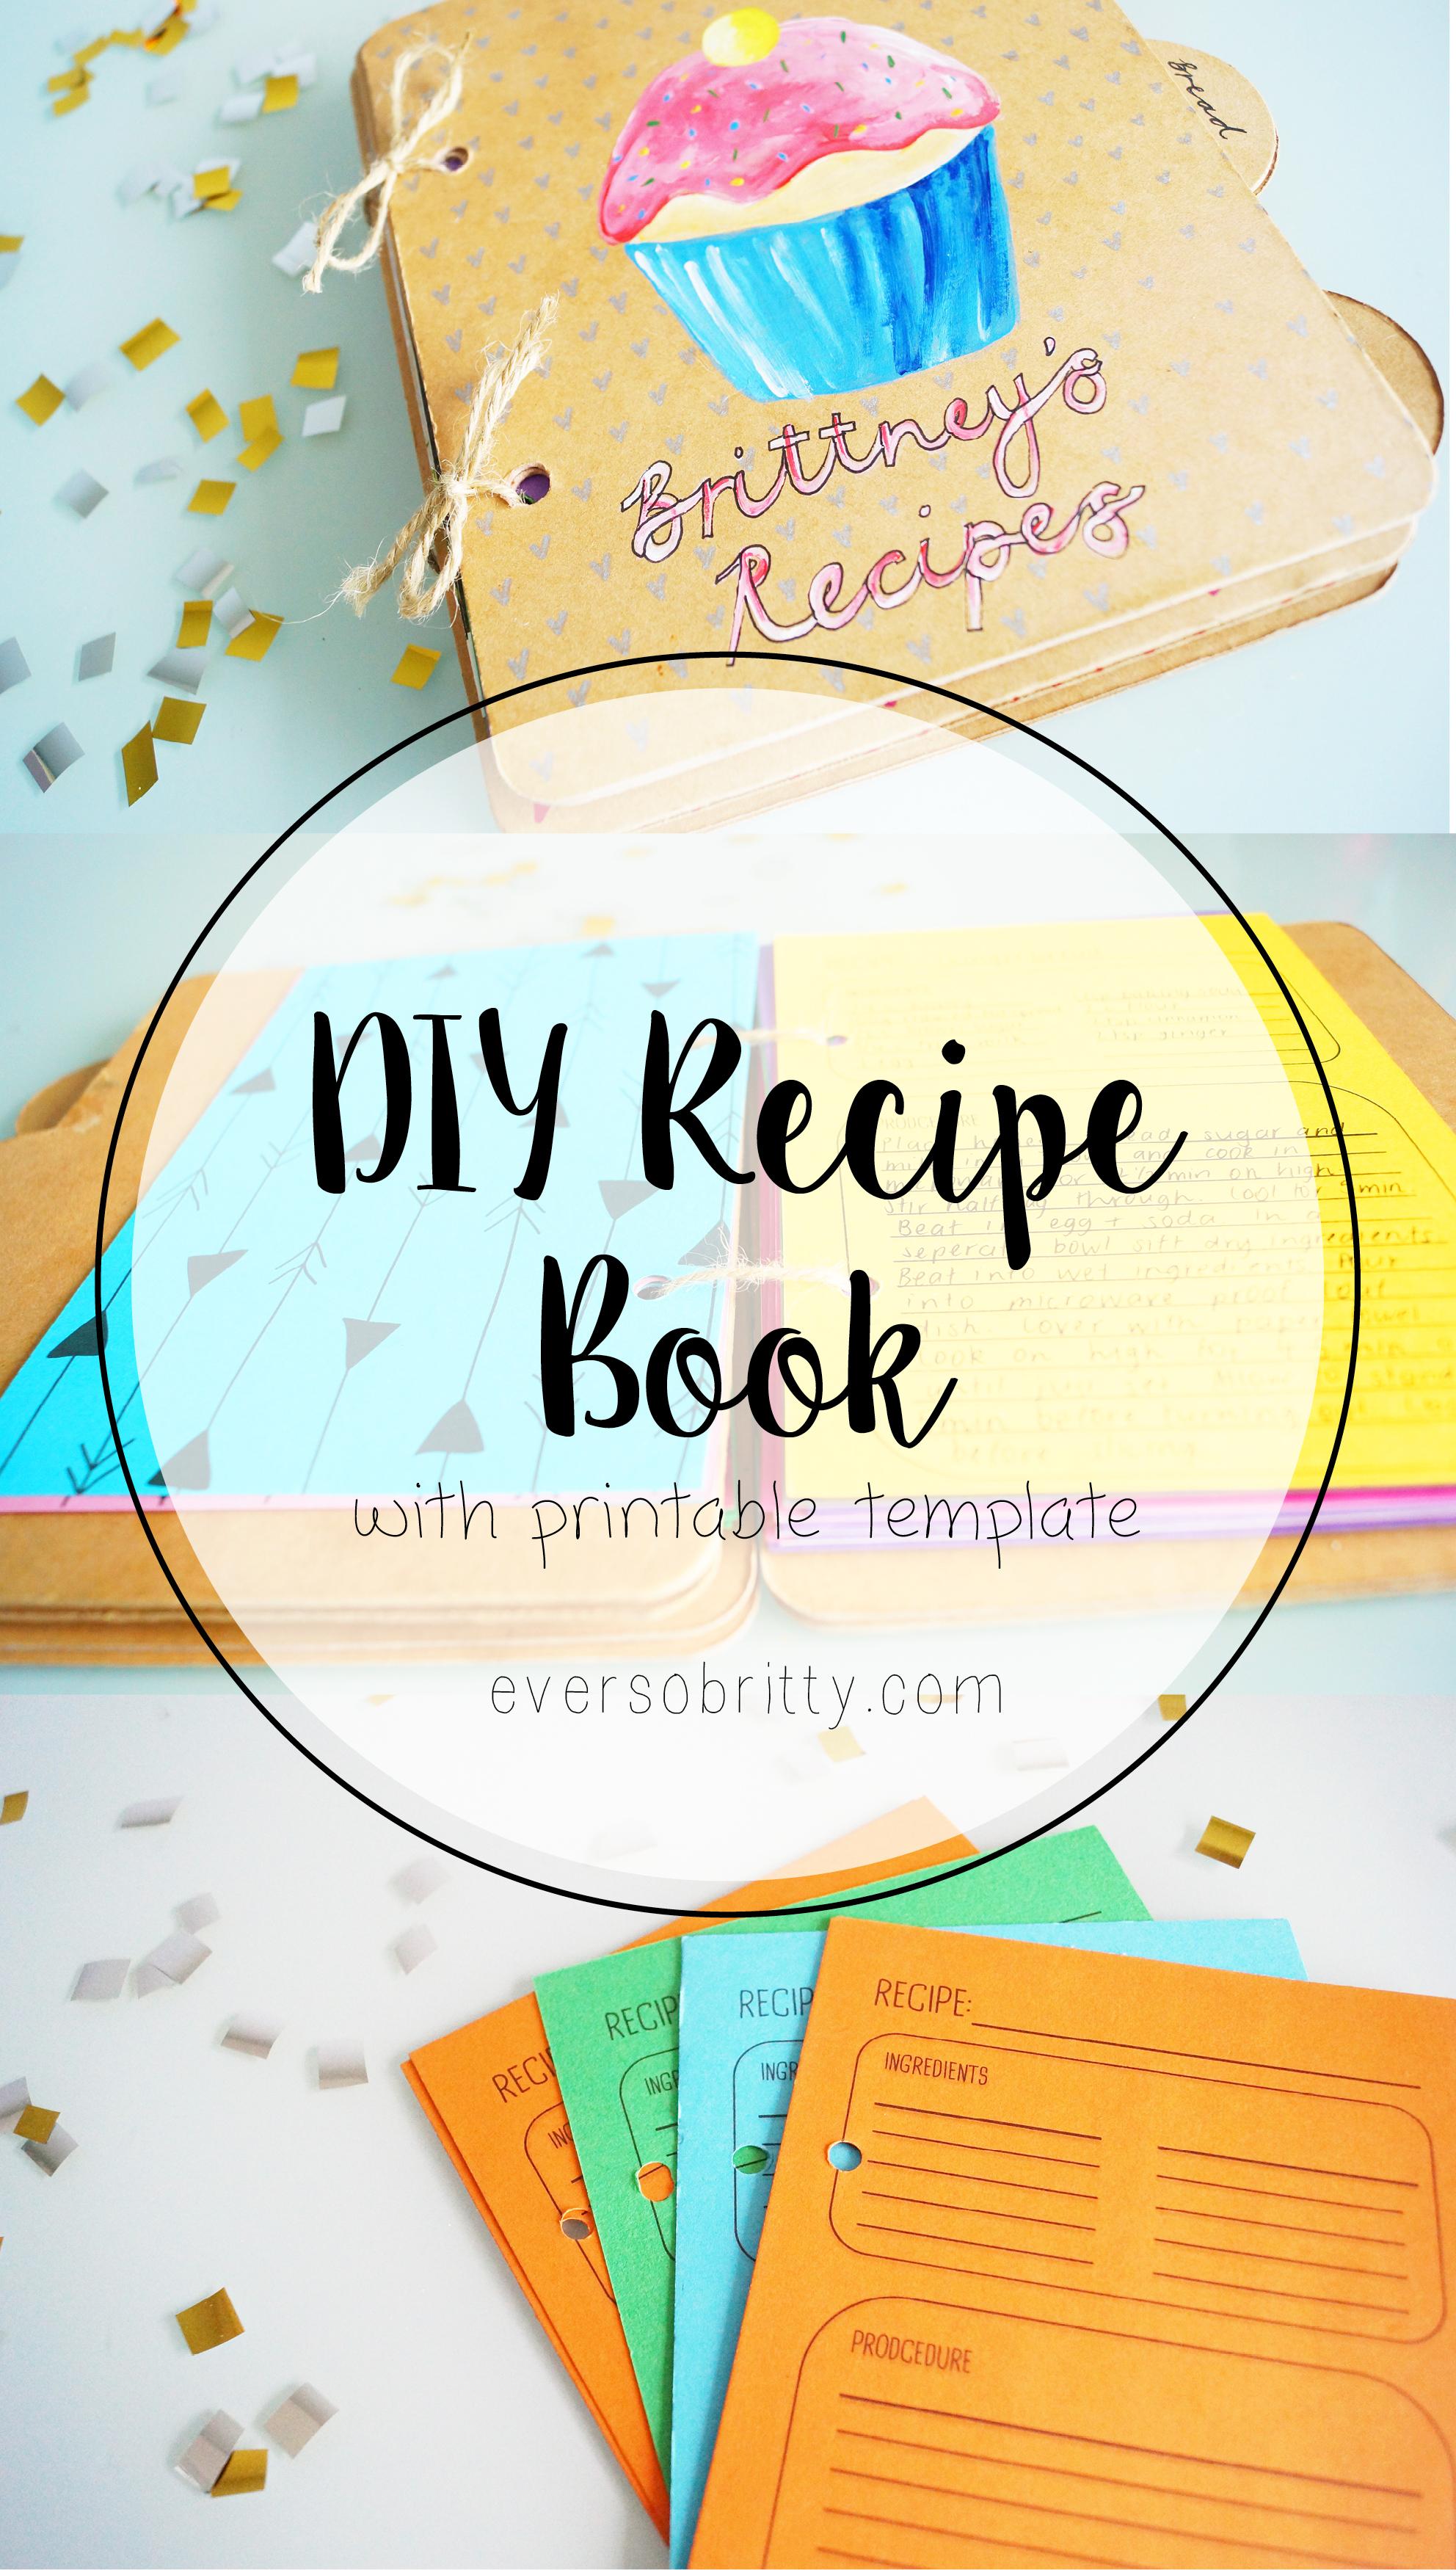 Diy Book Cover Template : Diy recipe book